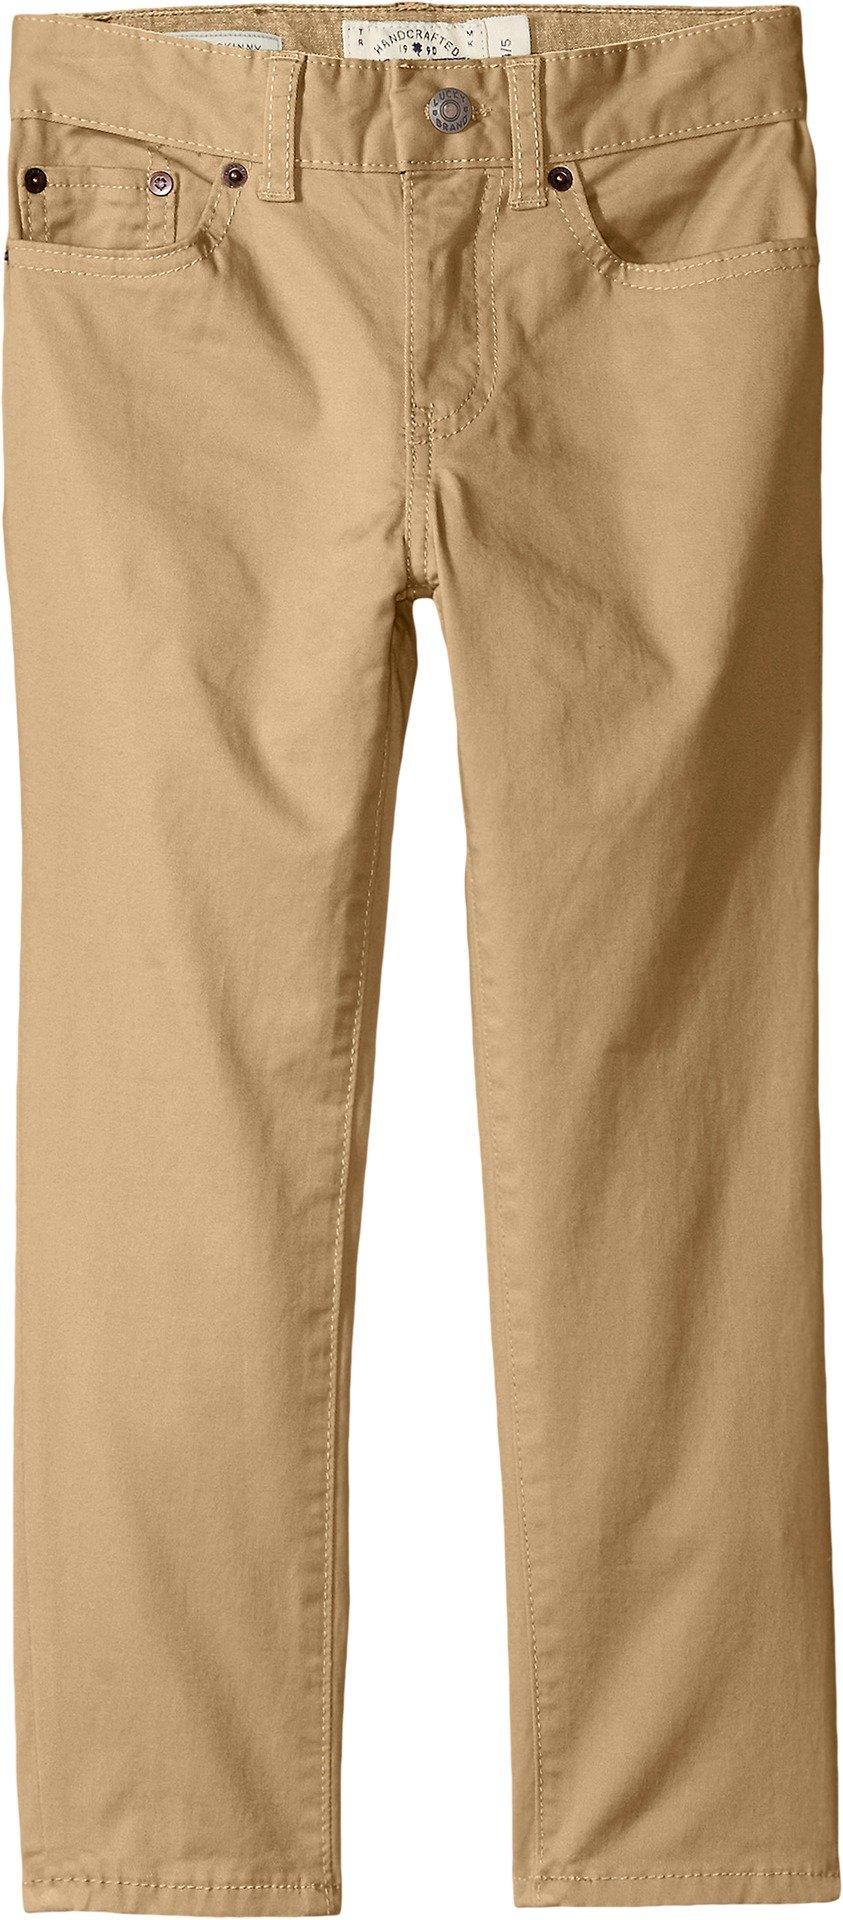 Lucky Brand Toddler Boys' 5 Pocket Stretch Twill Pant, Kelp, 3T